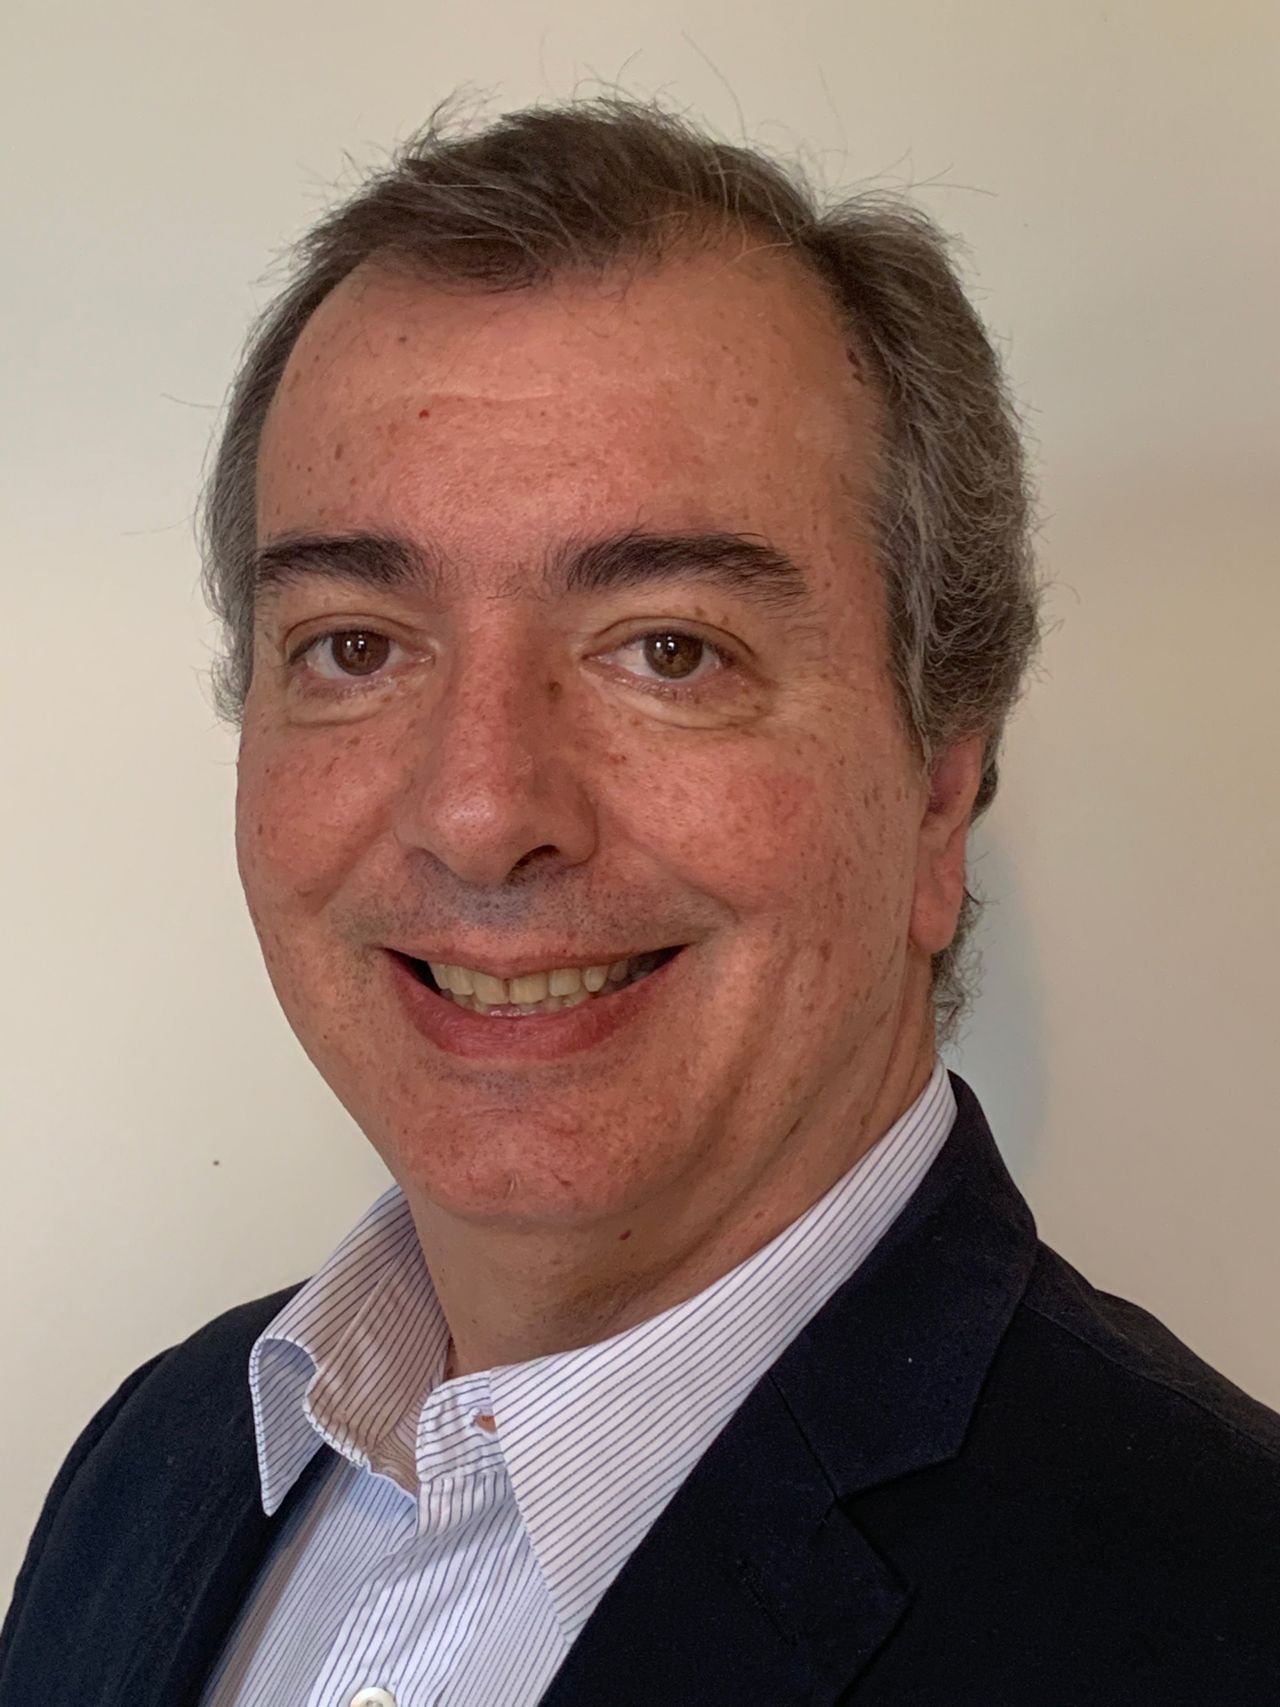 Sérgio Ferreira, Business Development Manager, Target Market Manager Building Finishing, Latin America